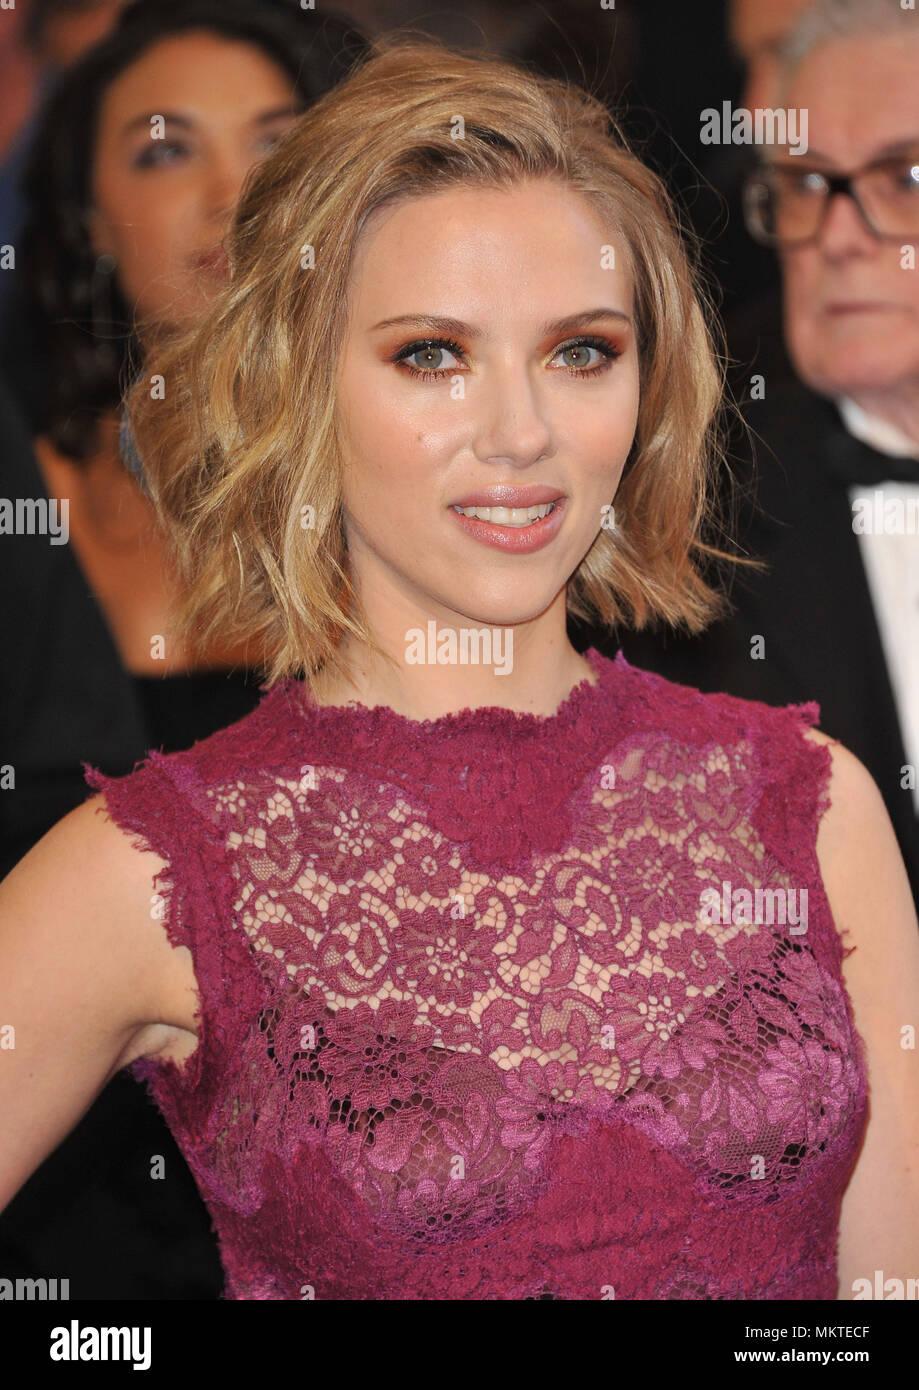 Scarlett Johansson At The 83th Academy Awards At The Kodak Theatre In Los Angeles A Scarlett